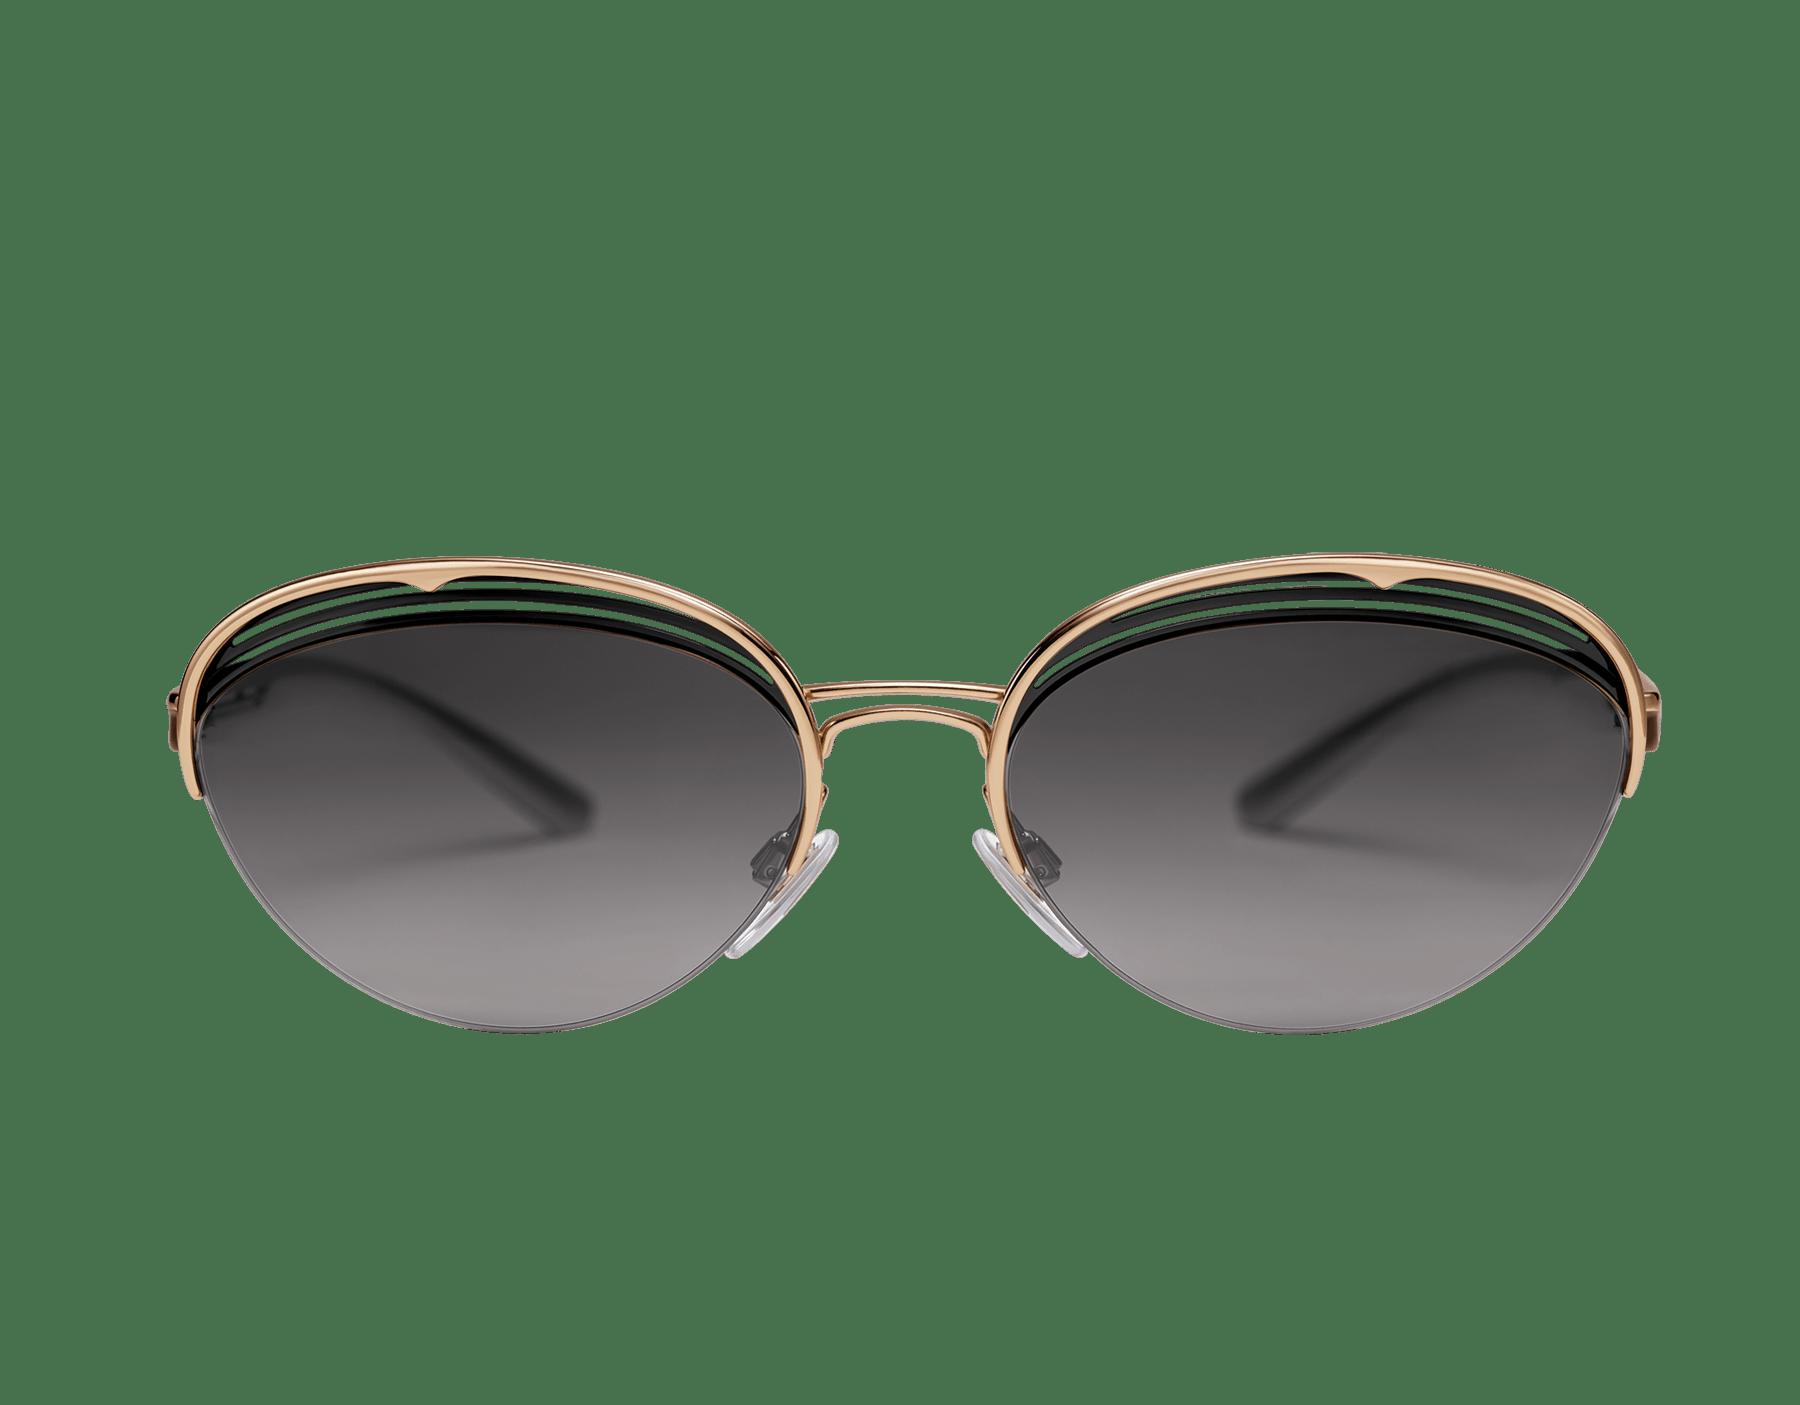 Bulgari B.zero1 B.retrovibe half rim oval metal sunglasses. 903893 image 2